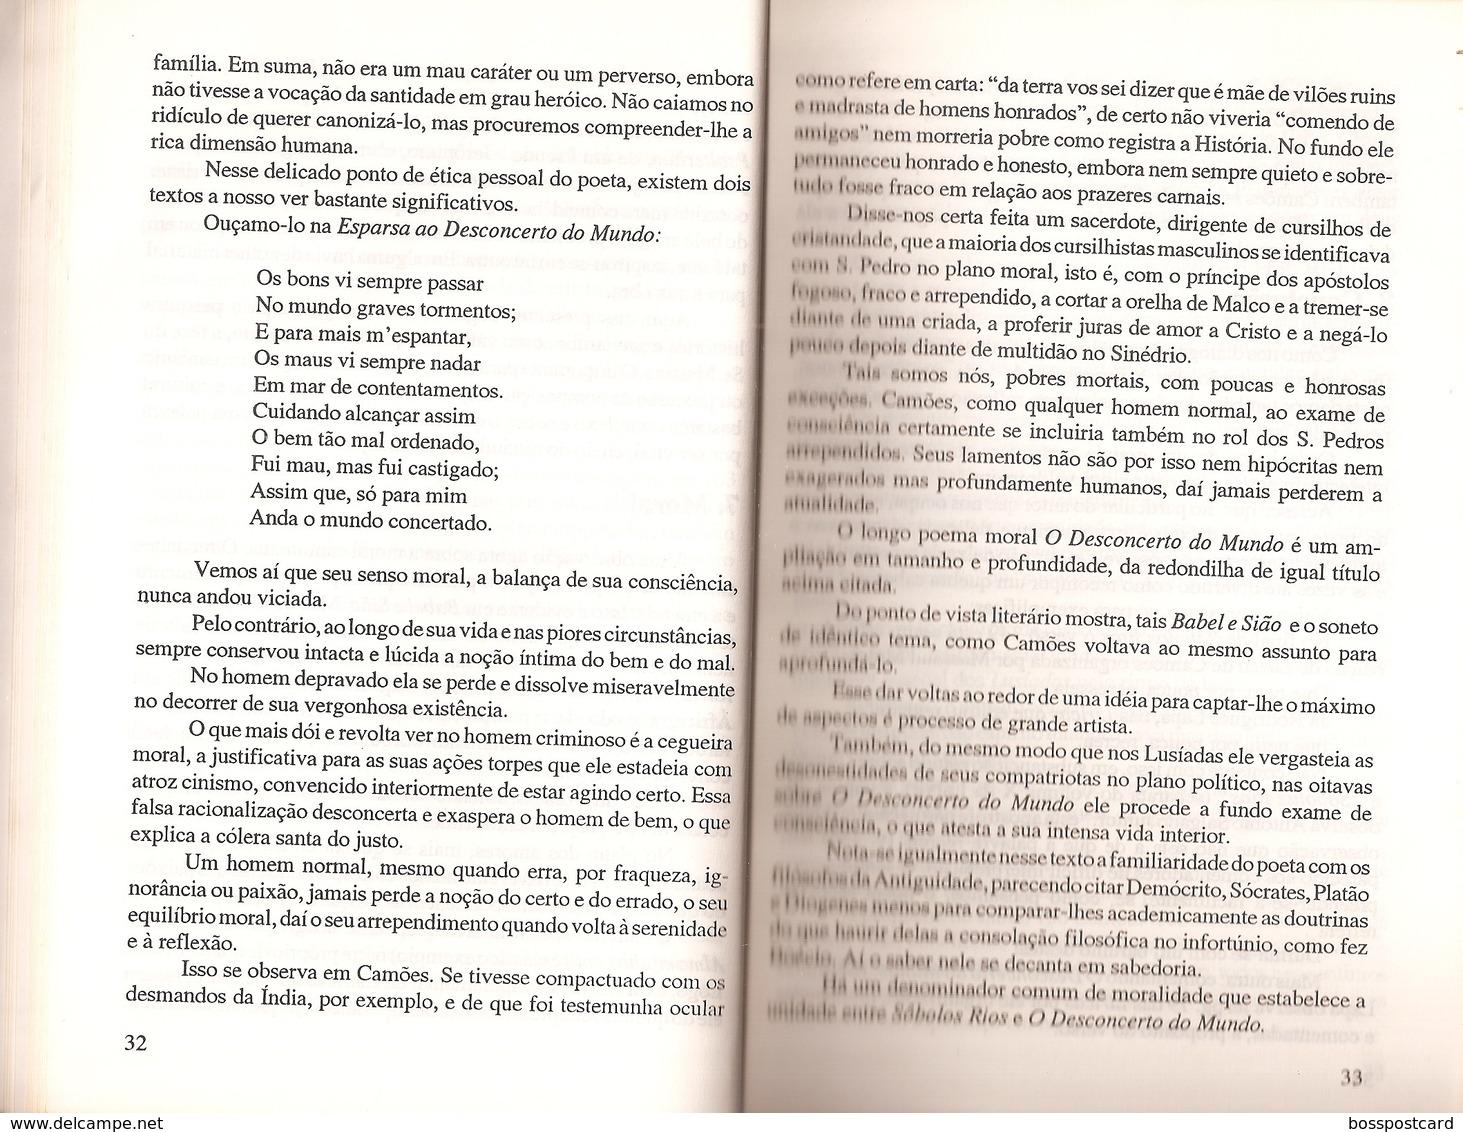 Bahia - Camões E O Salmista - Brasil - Poetry